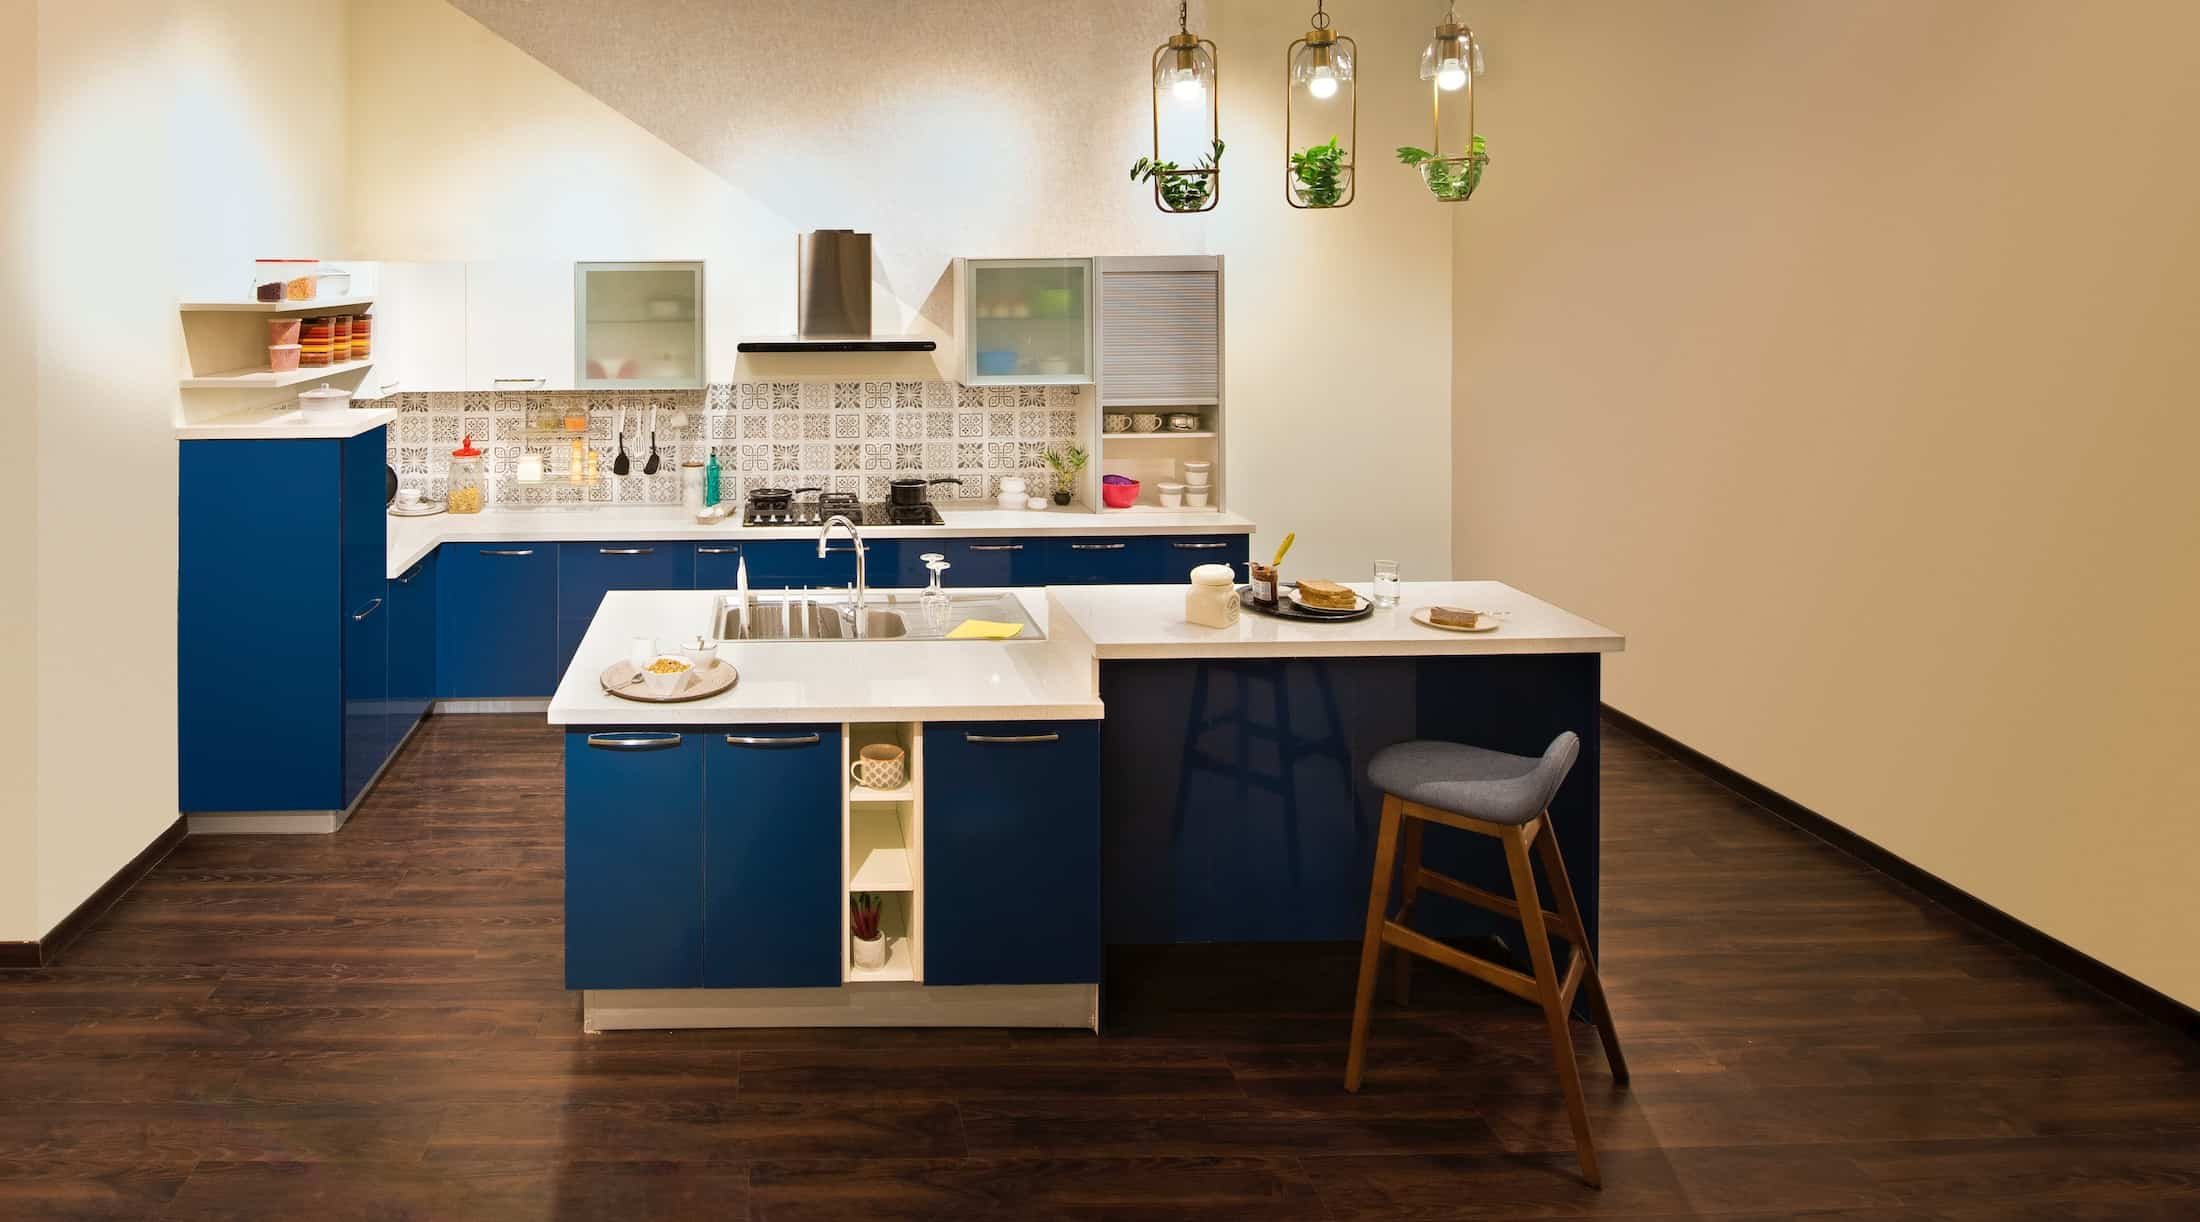 Change kitchen lighting